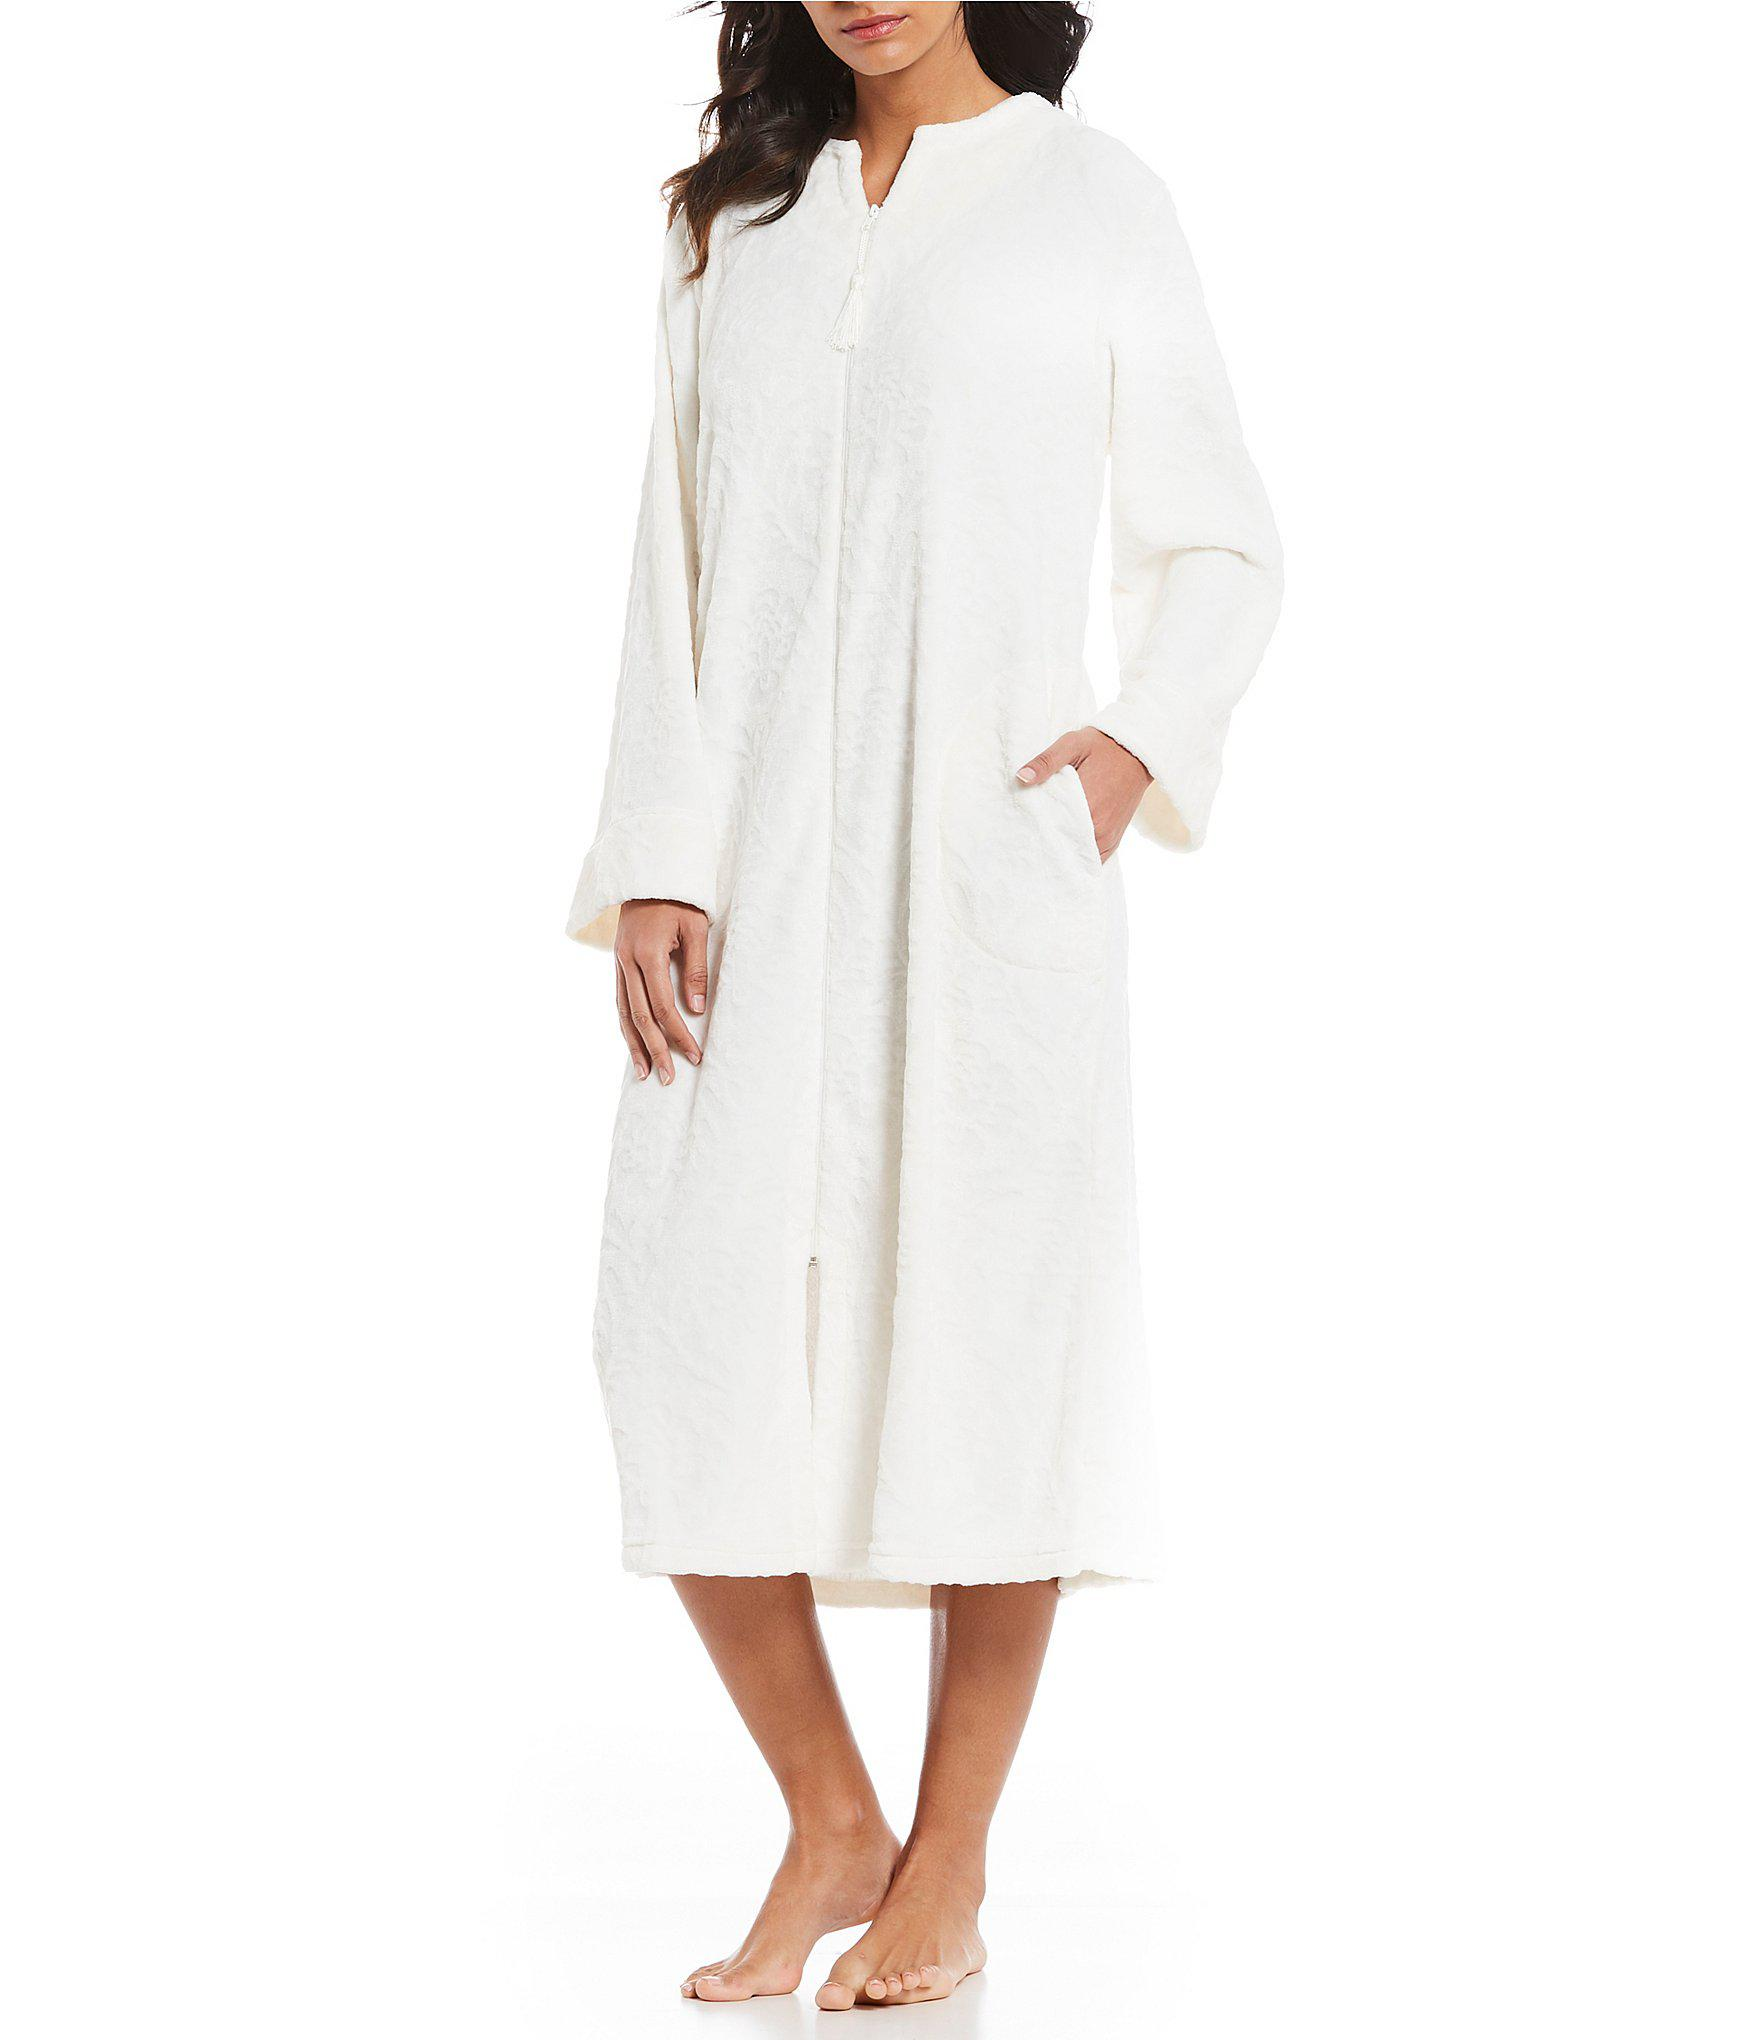 Lyst - Miss Elaine Damask French Fleece Long Zip-front Robe in White fecda539f